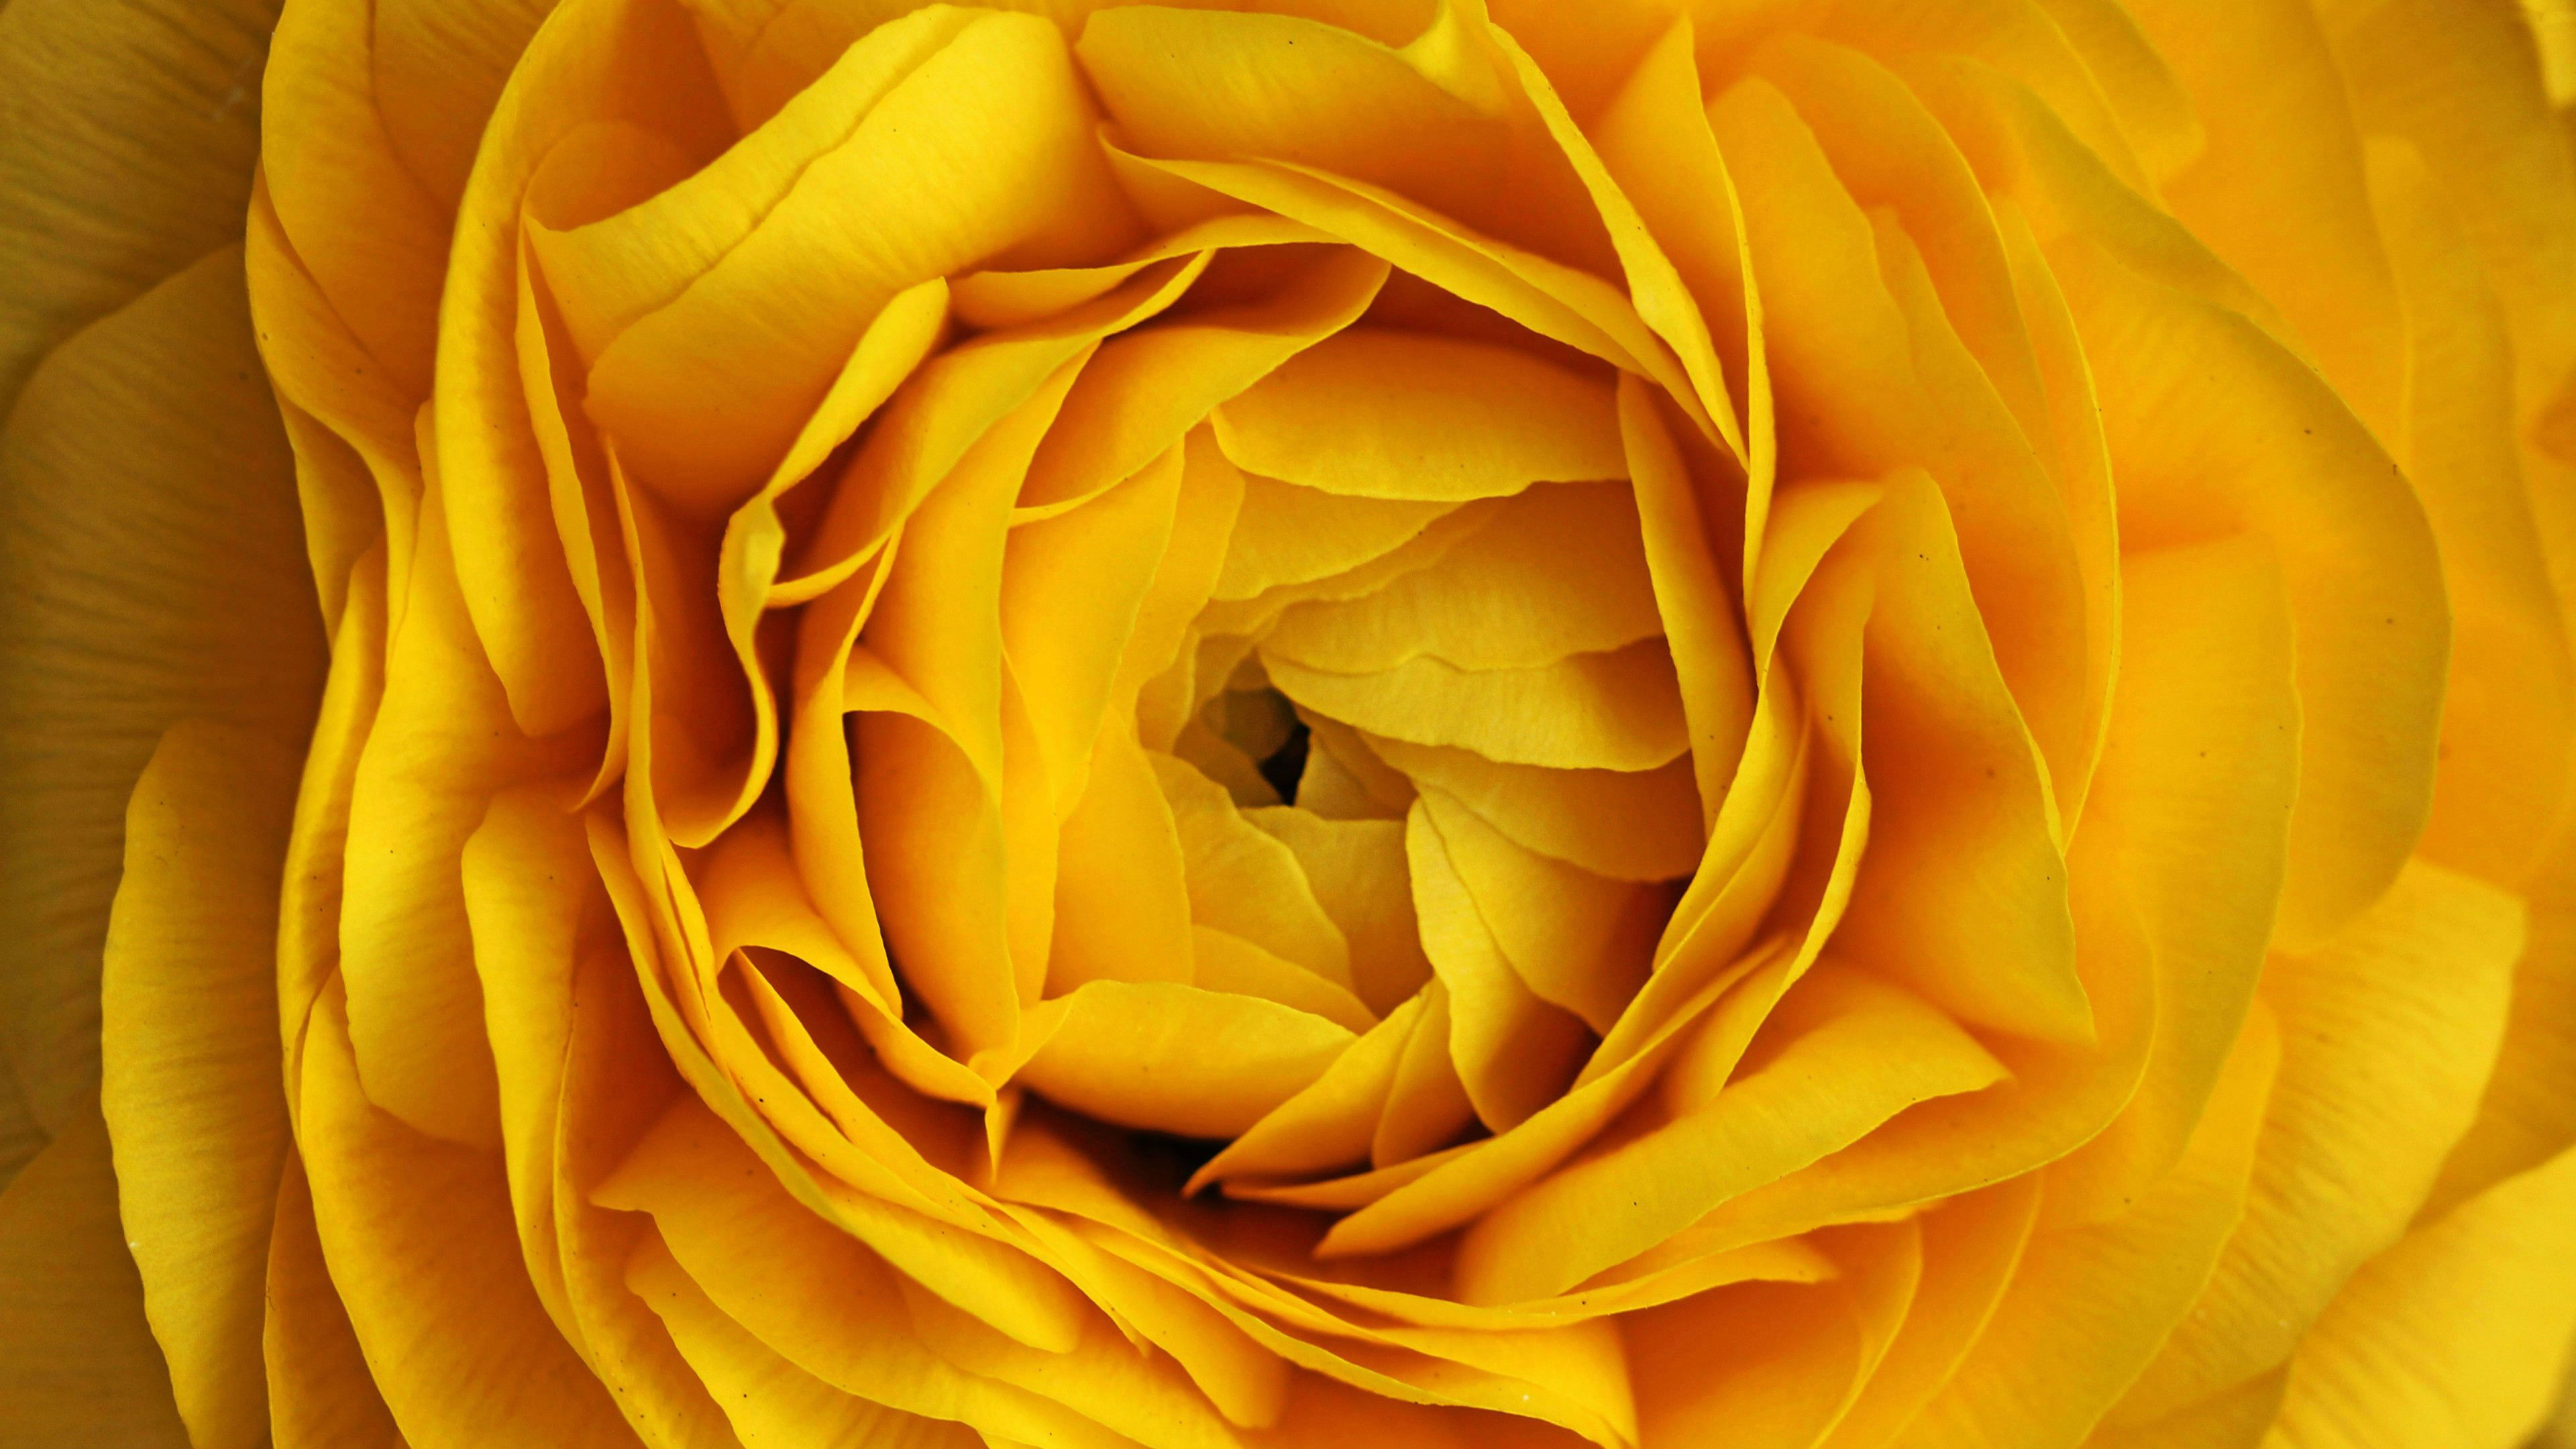 Ultra HD Wallpaper, flower 4K Yellow Rose Flower HD